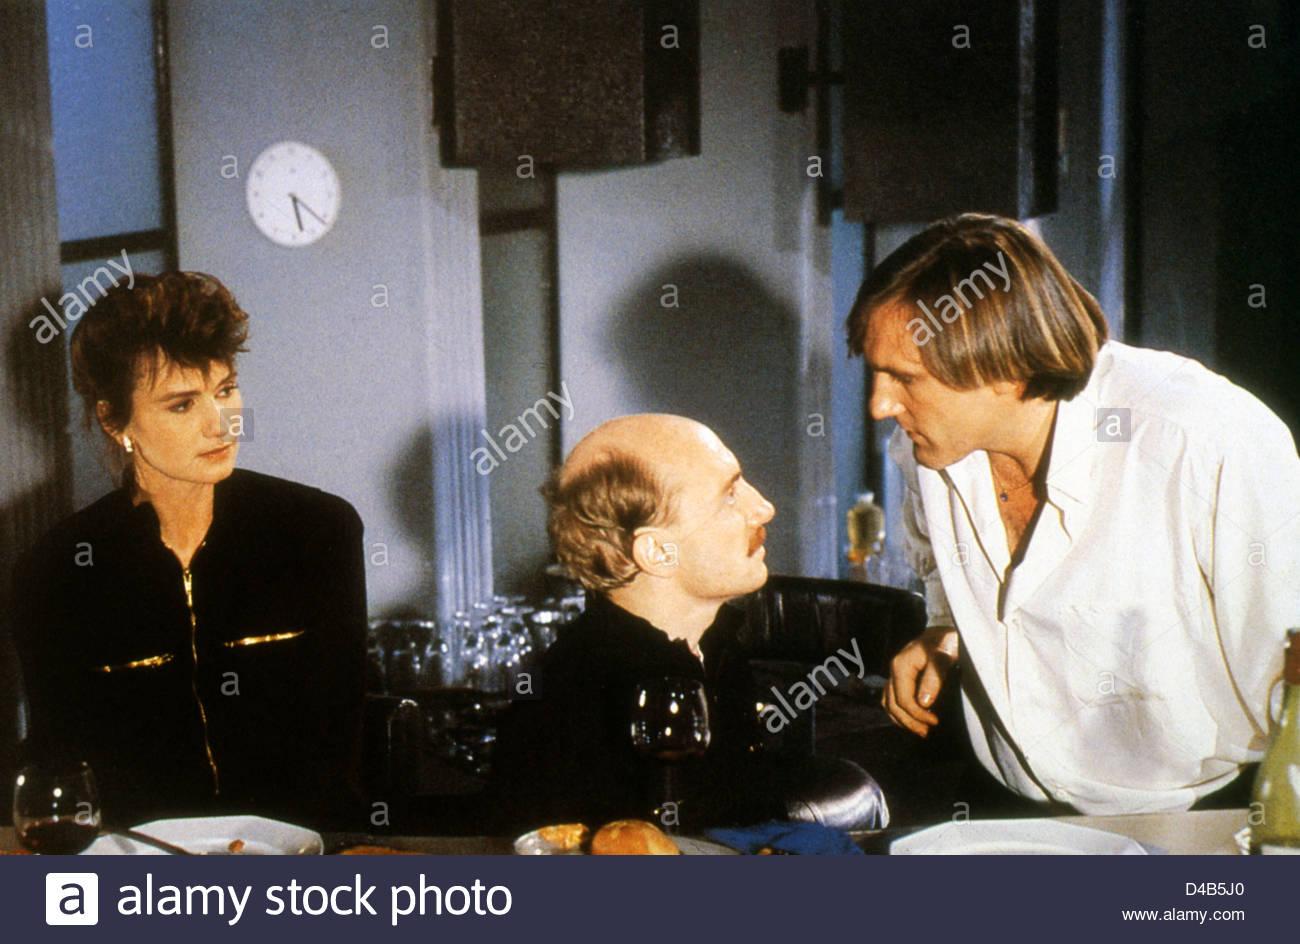 TENUE DE SOIRÉE (1986) MENAGE (ALT) MIOU MIOU MICHEL BLANC GERARD DEPARDIEU BERTRAND BLIER (DIR) TDS 001 MOVIESTORE Stockbild